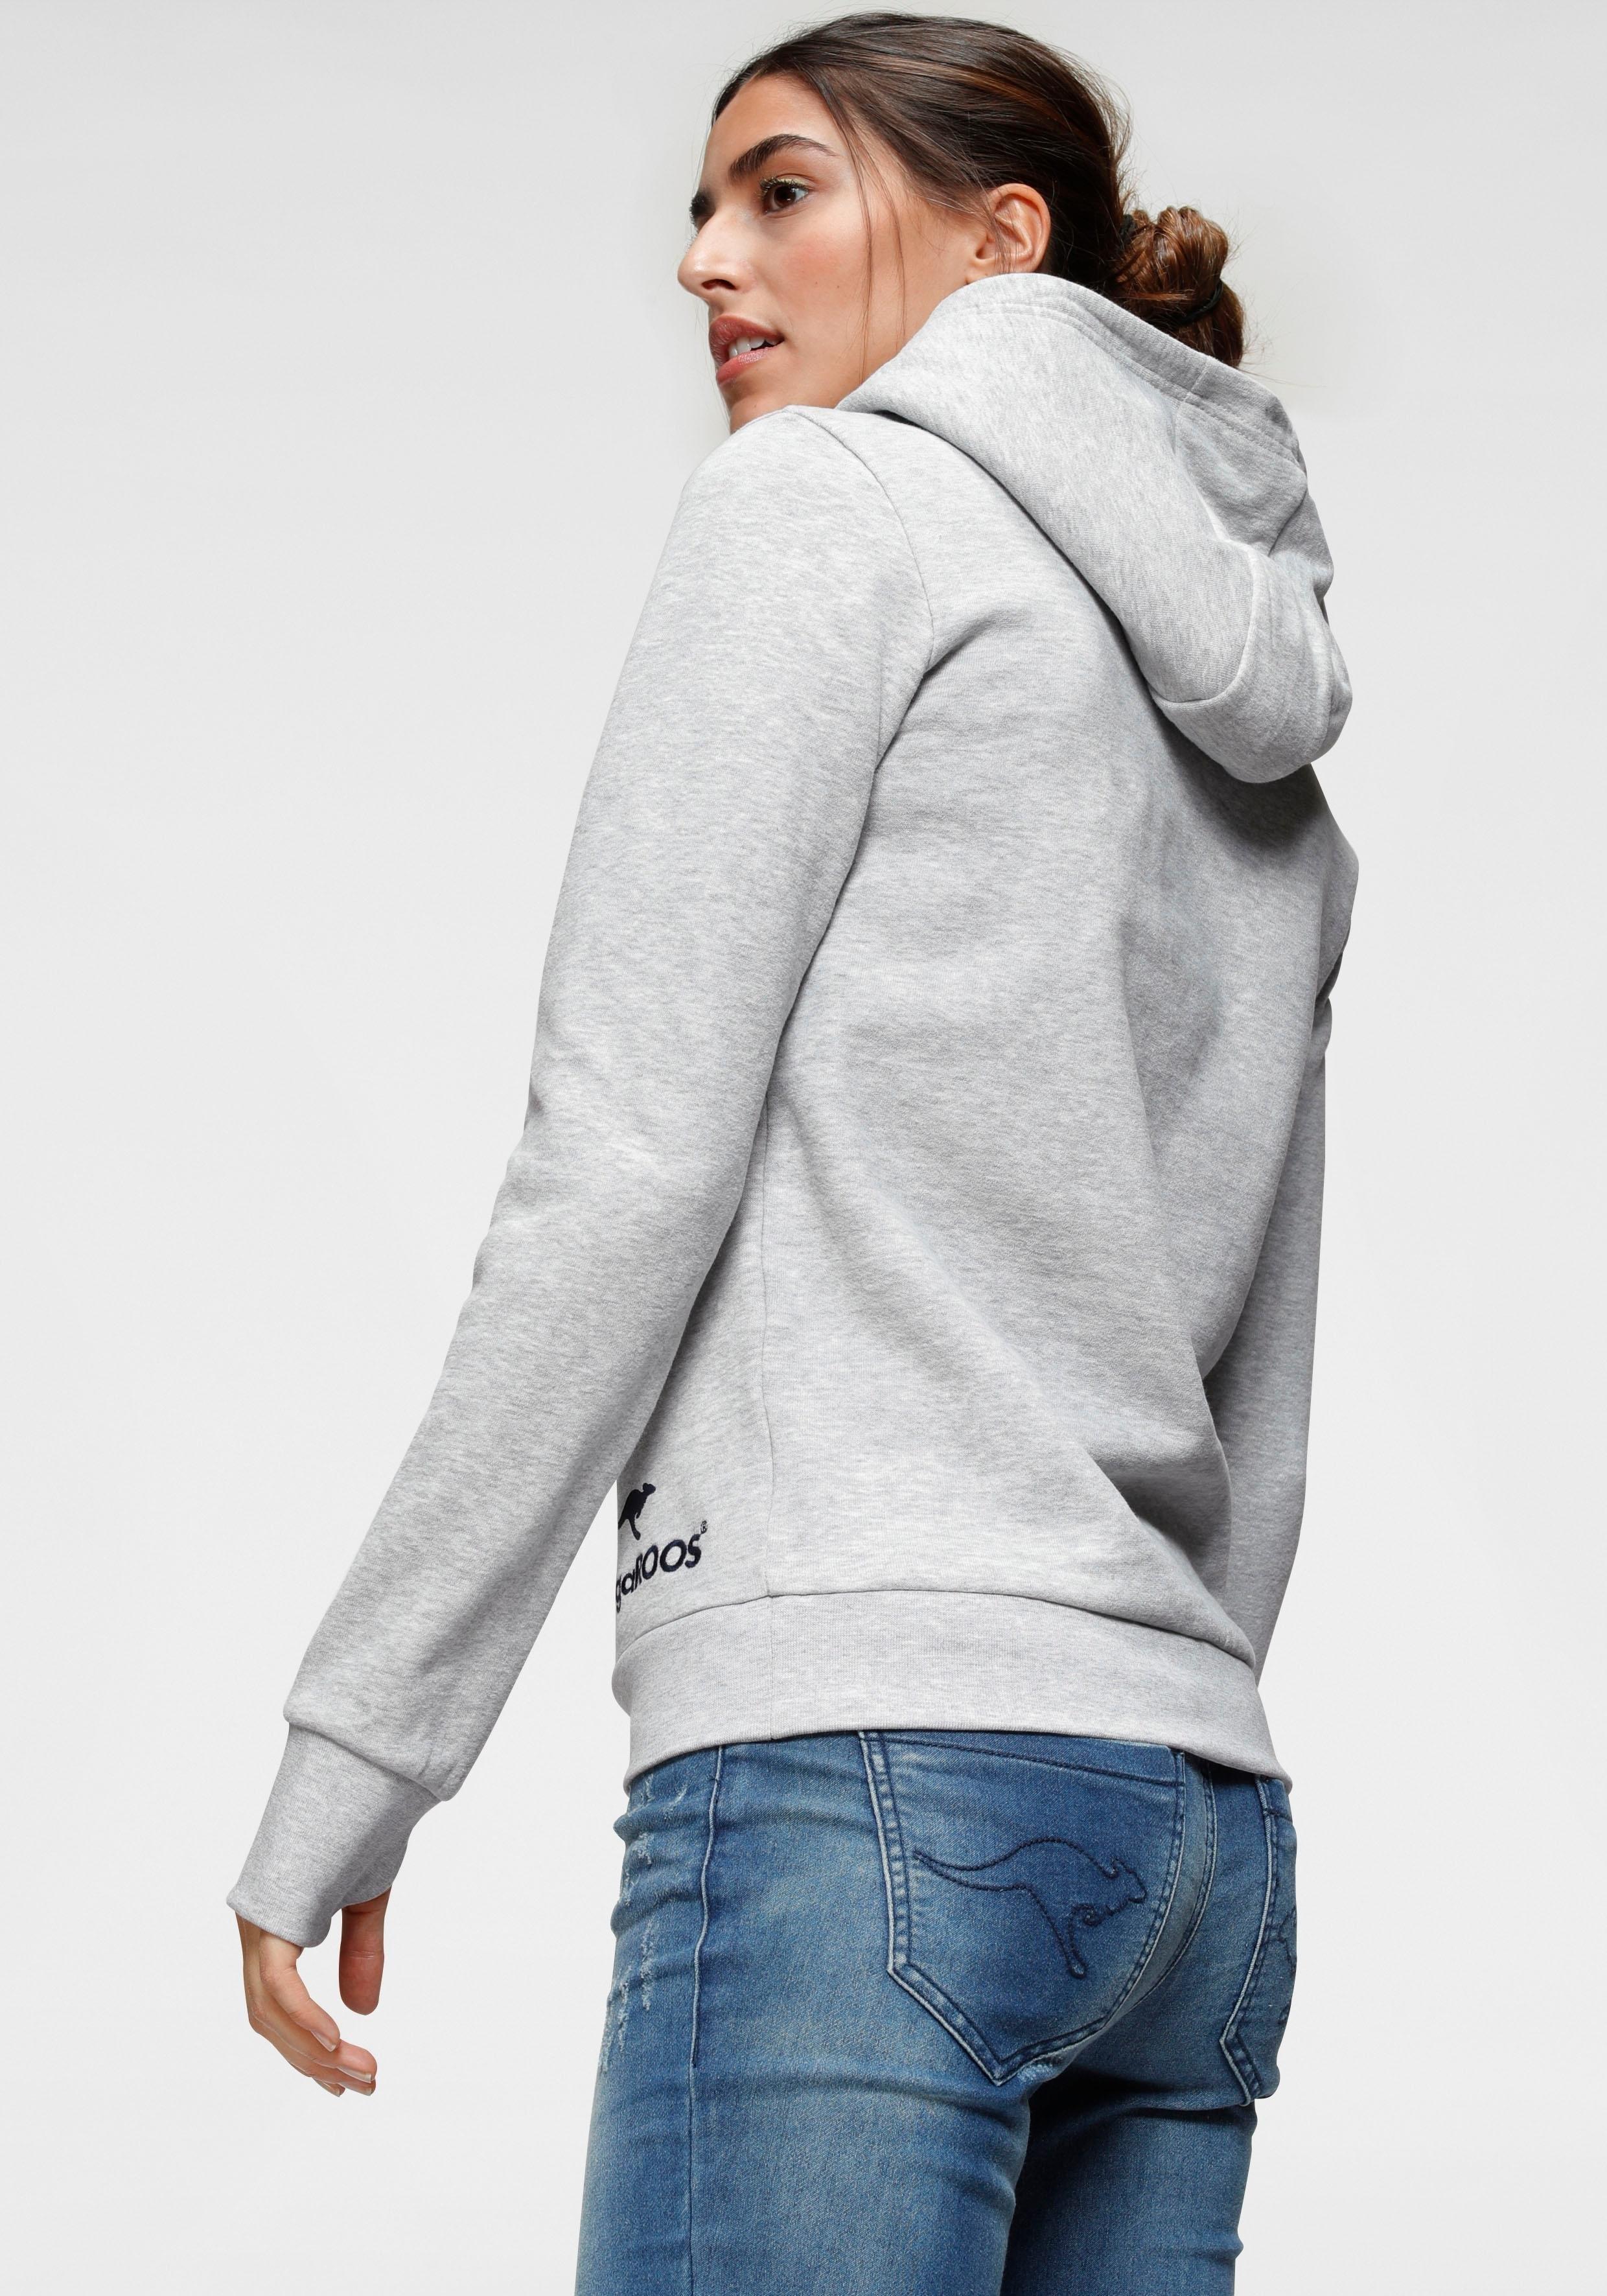 KangaROOS hoodie veilig op otto.nl kopen